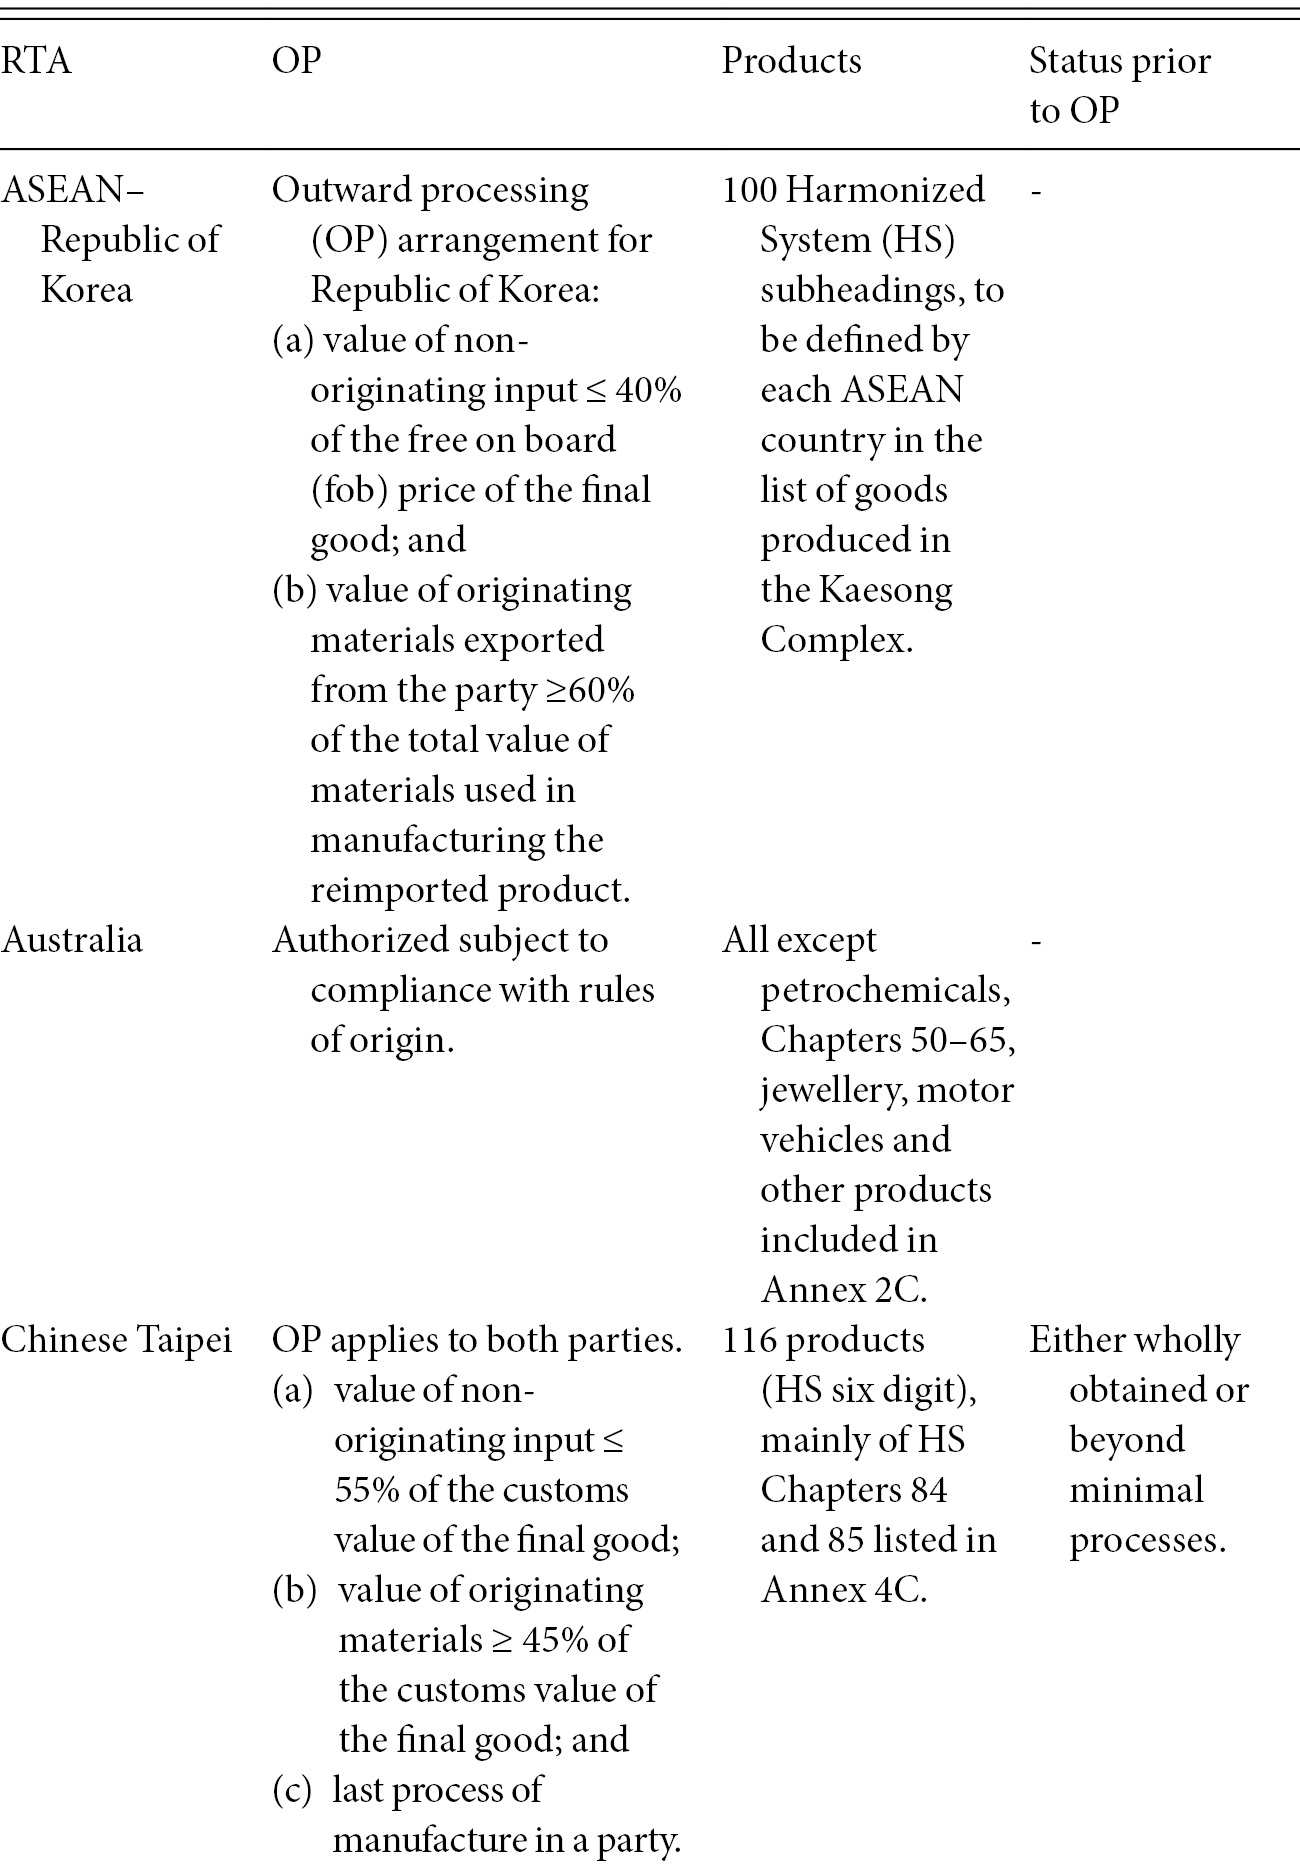 Preferential rules of origin in regional trade agreements